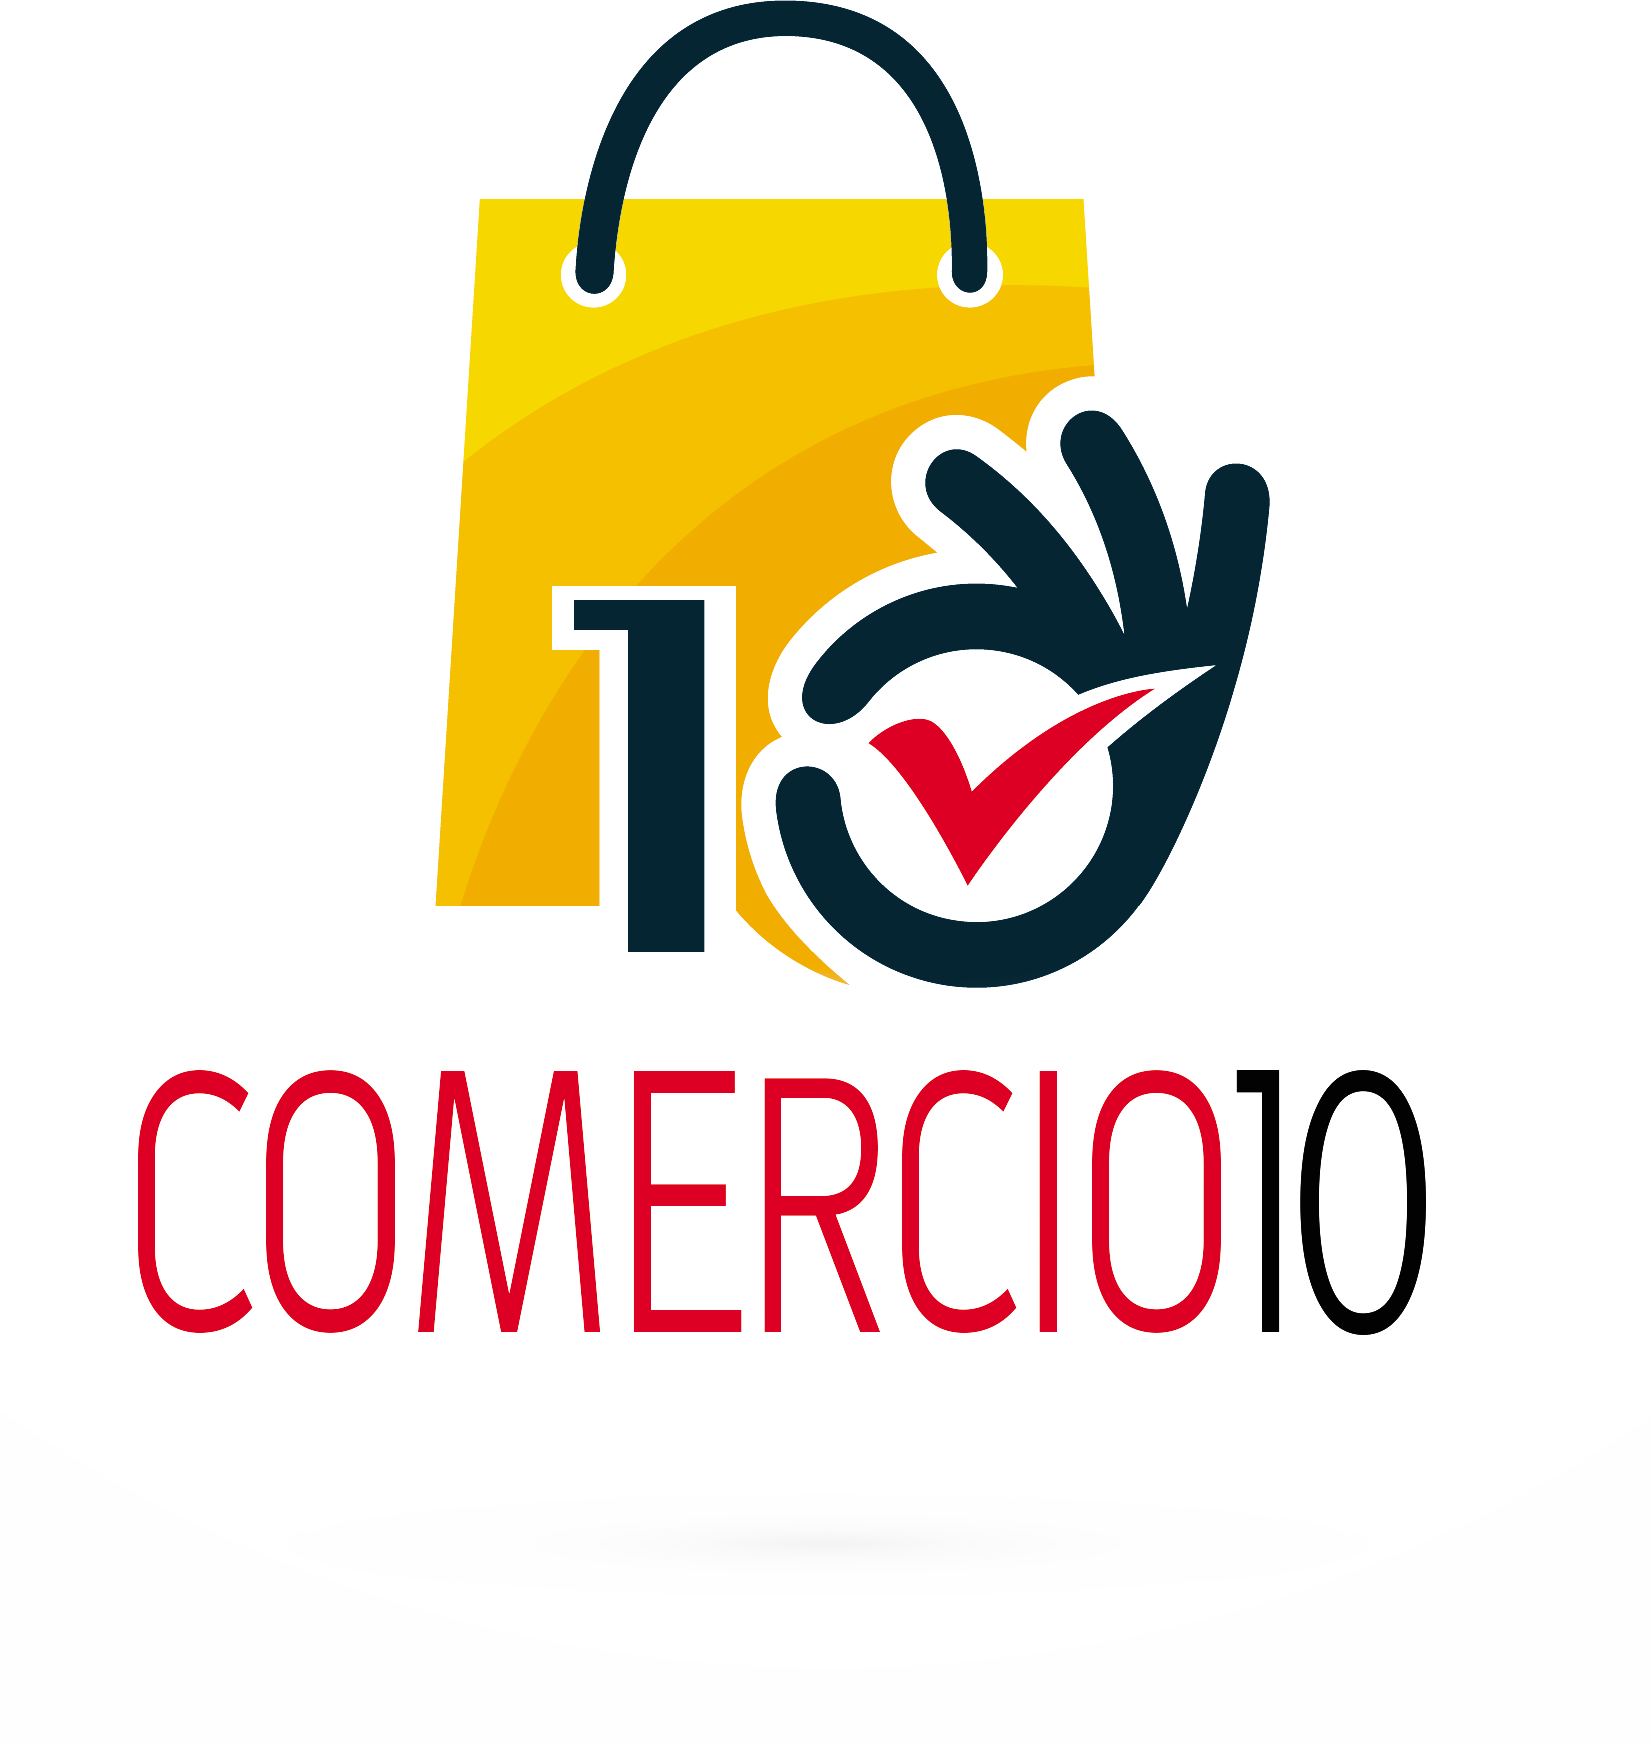 COMERCIO10